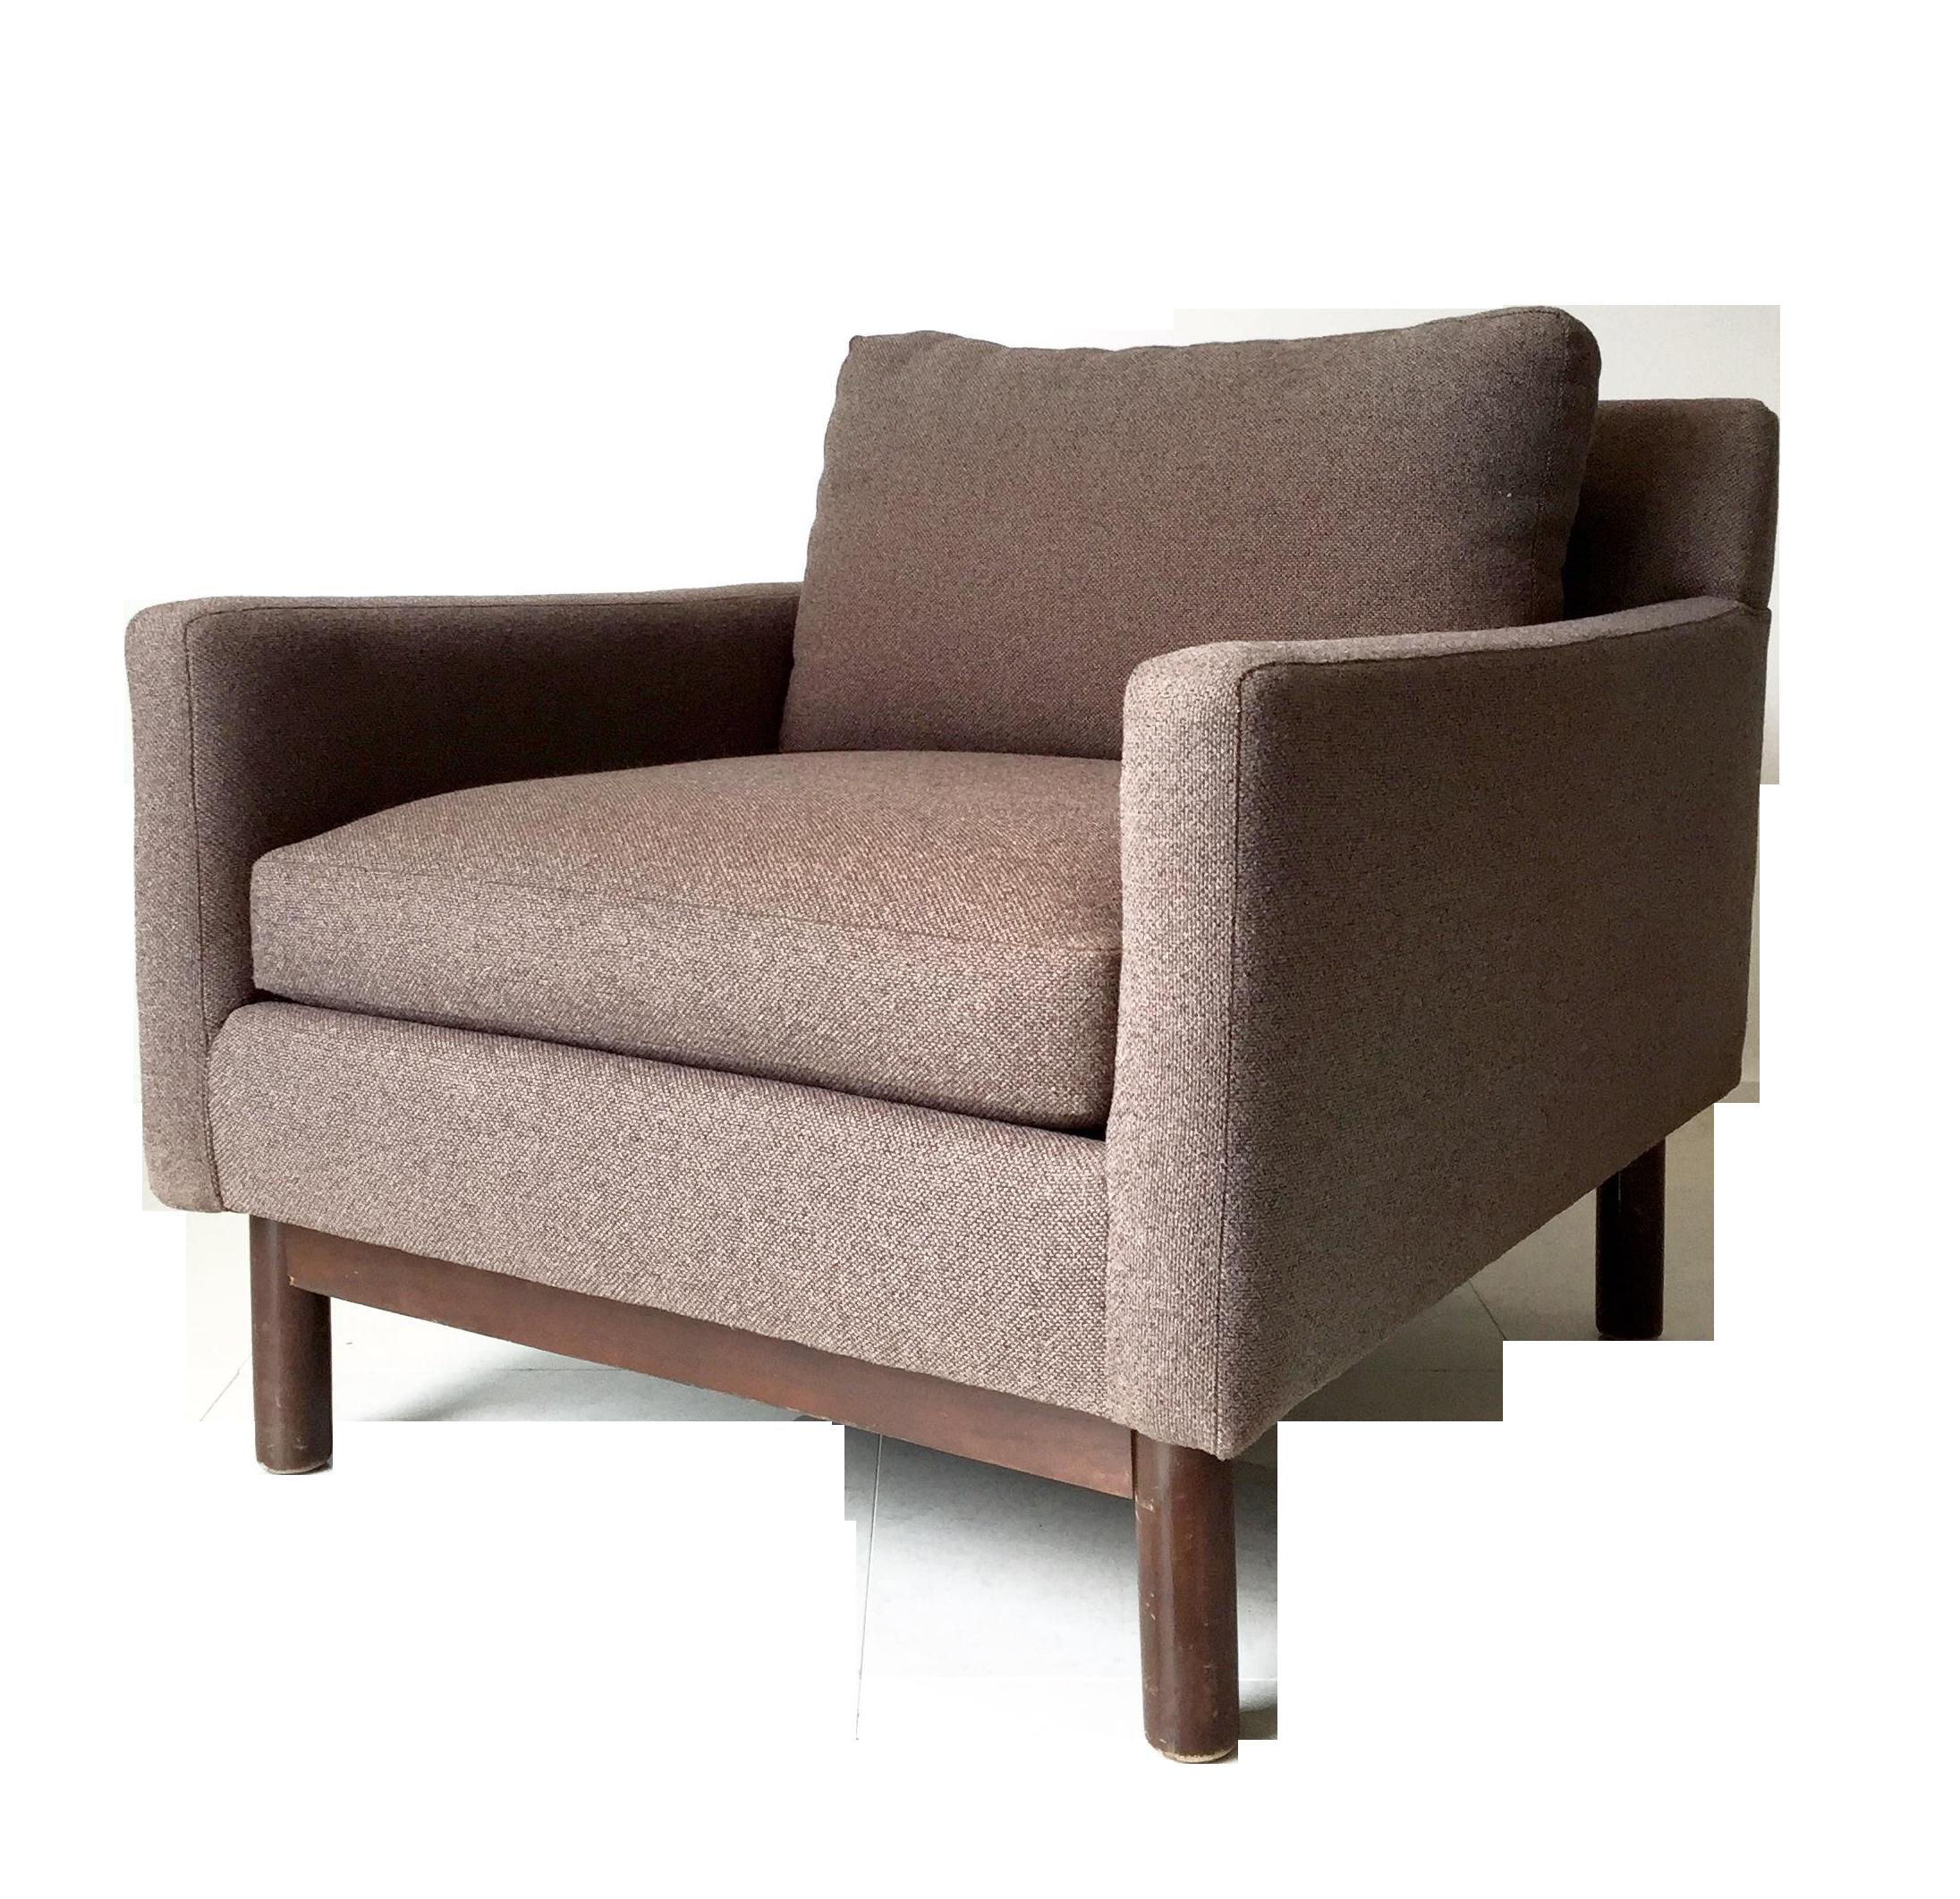 Dunbar Style Club Chair